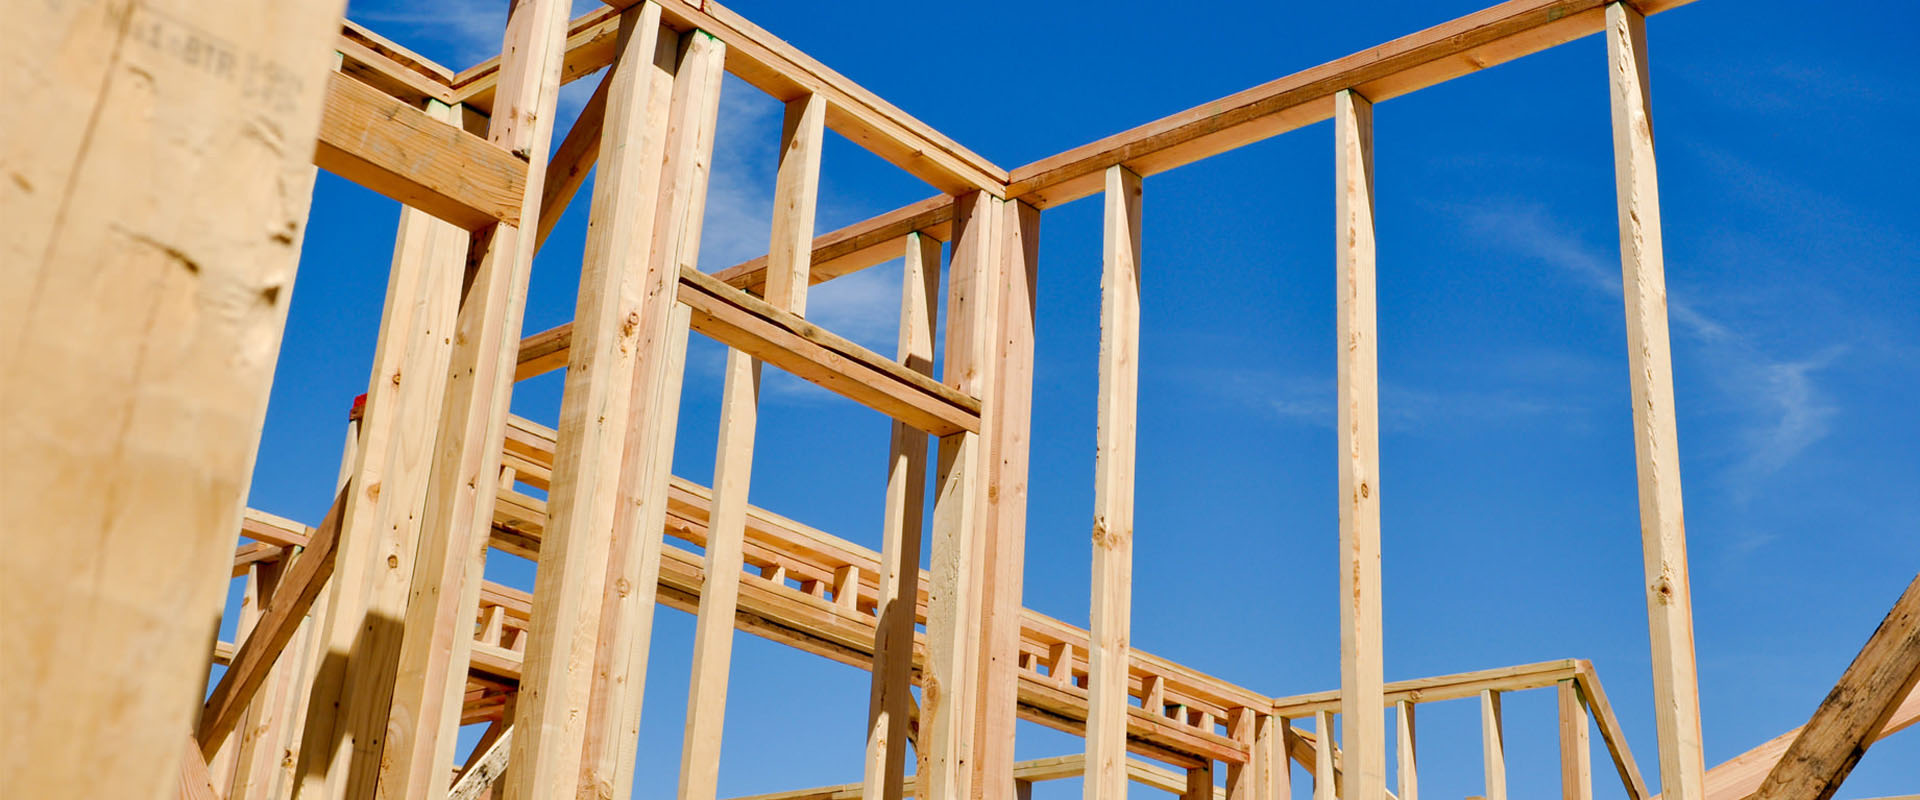 timber-work-by-desert-leisure